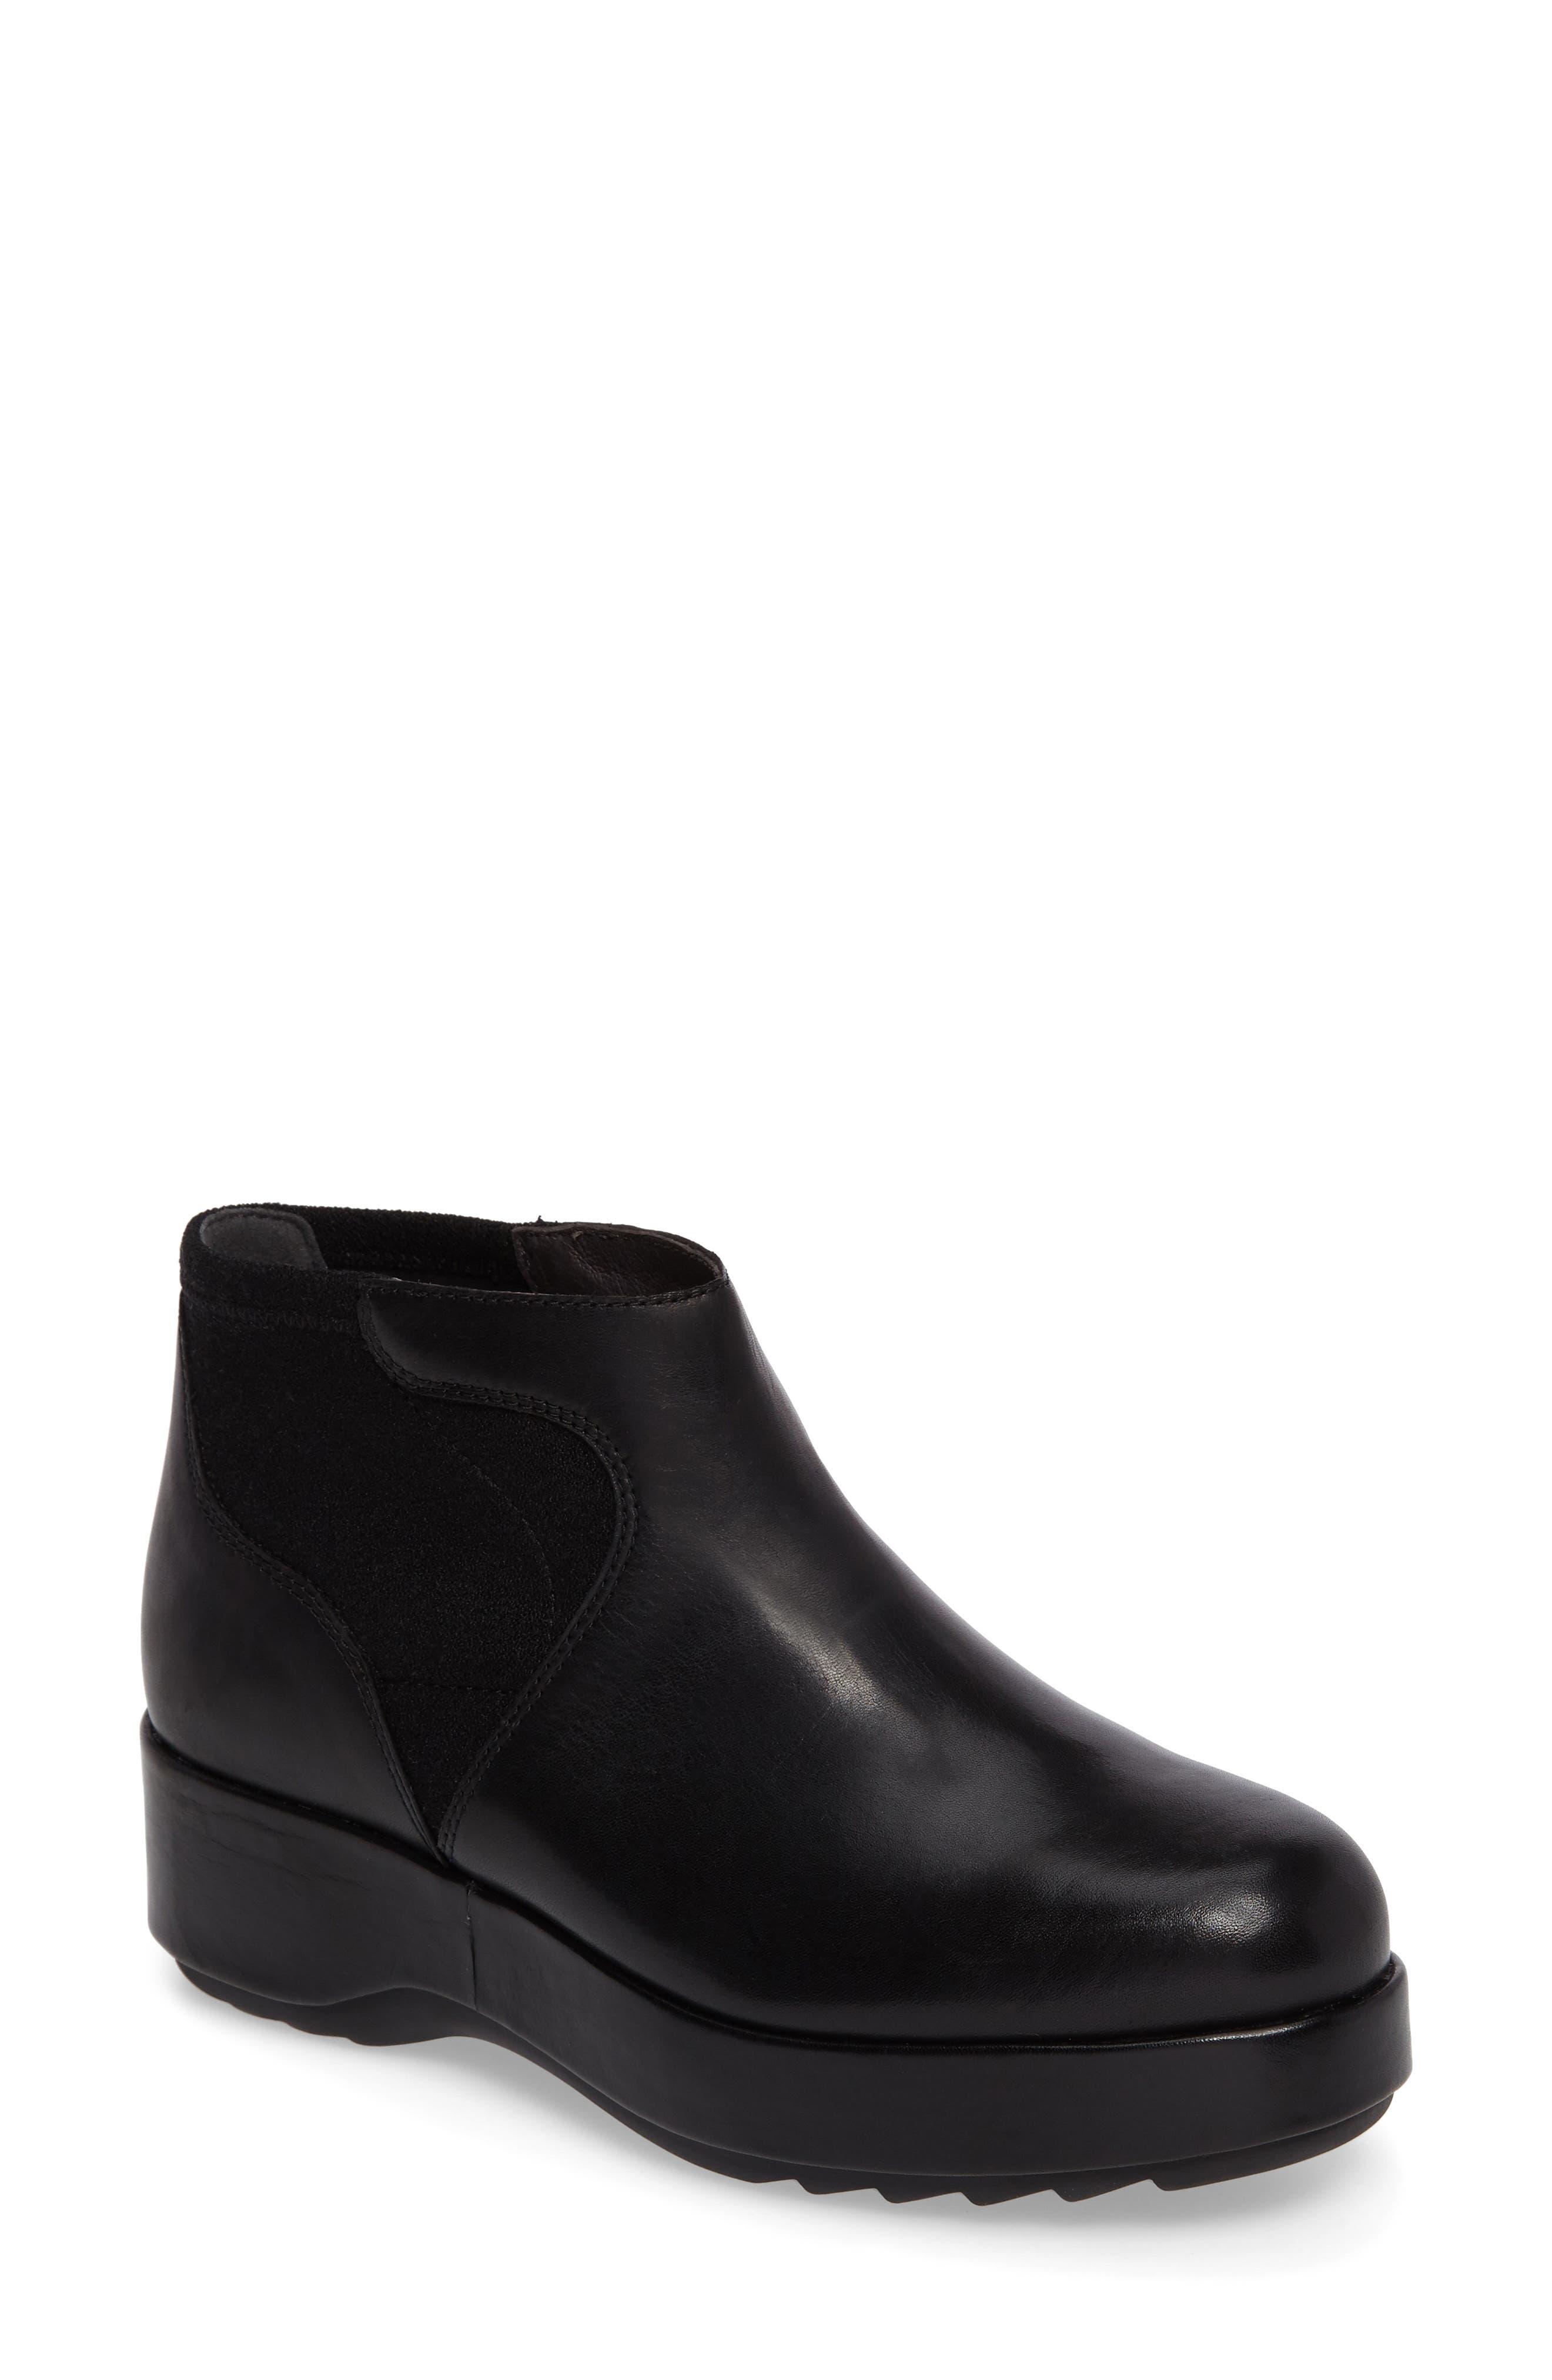 Dessa Platform Boot,                         Main,                         color, Black Leather